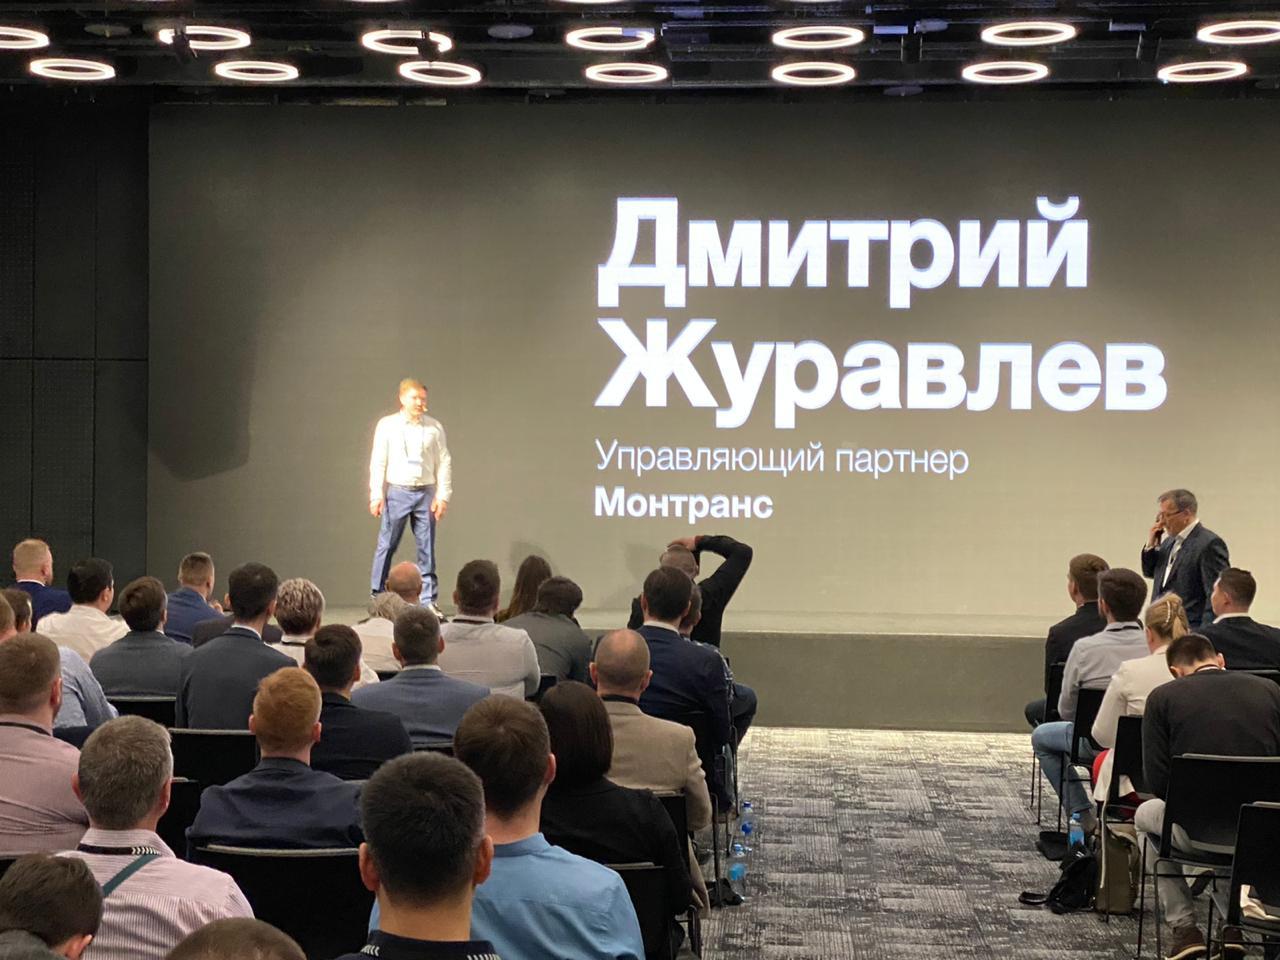 Дмитрий Журавлев на Навиторинге